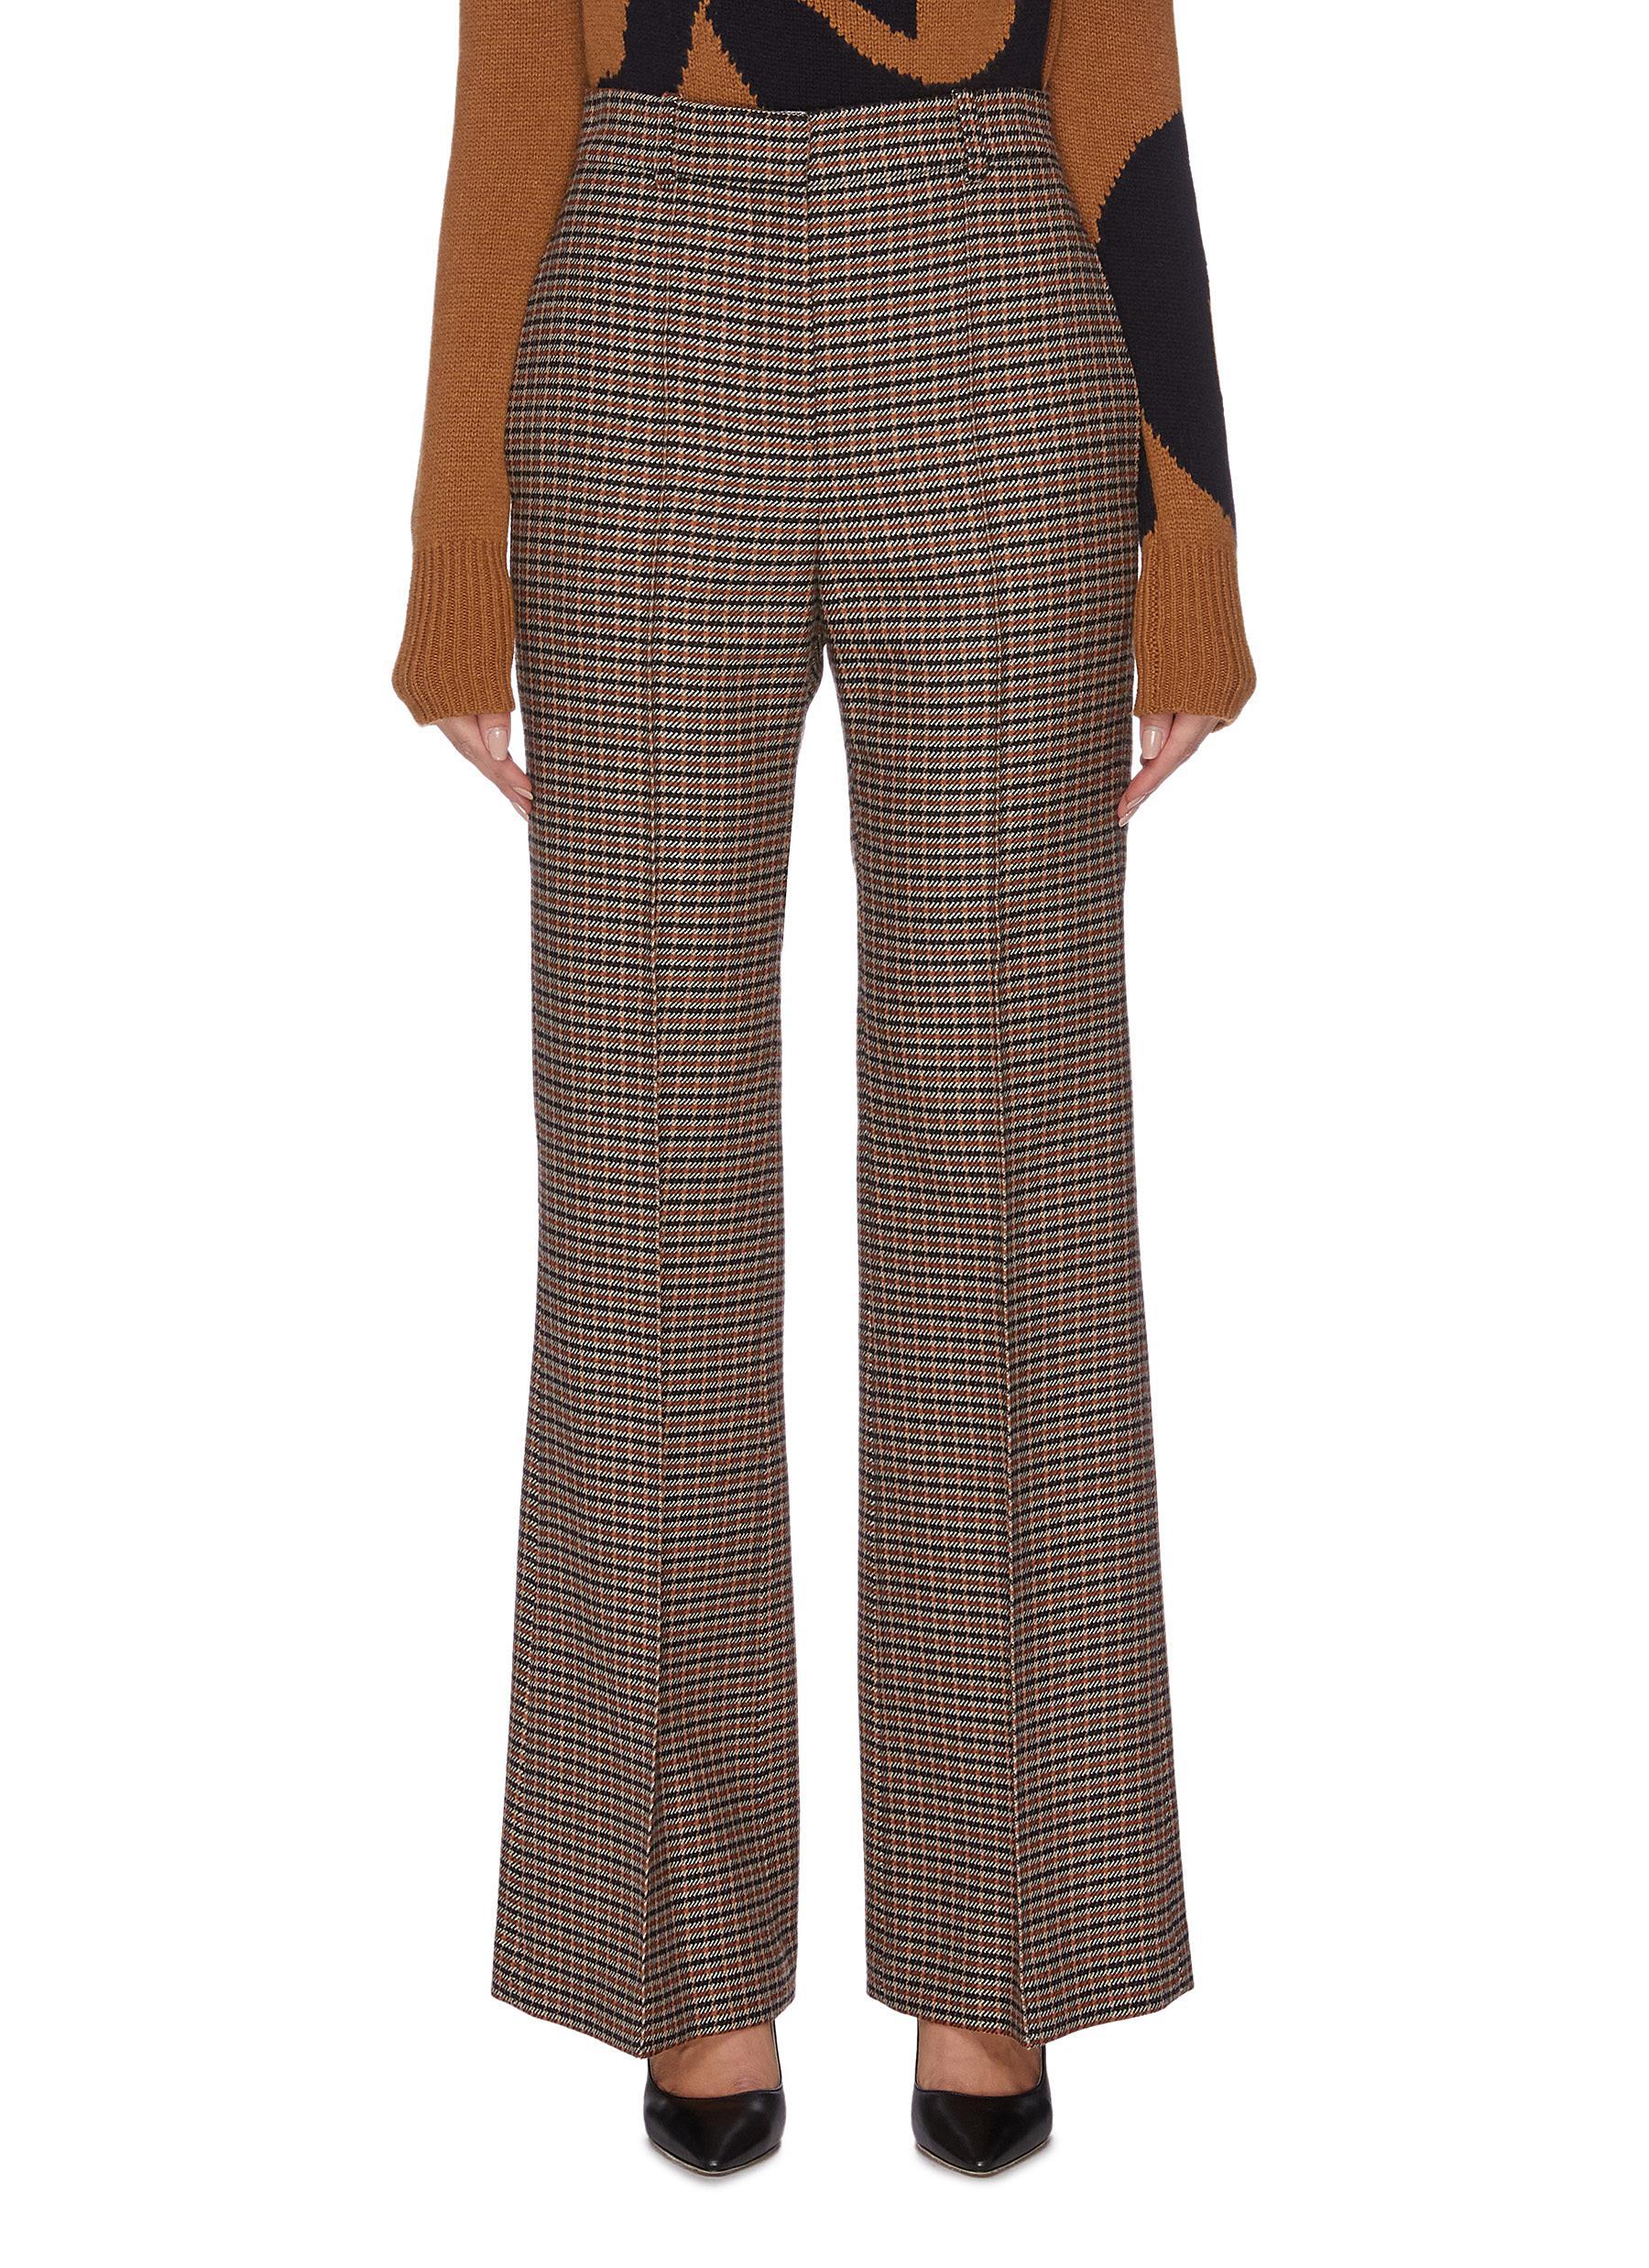 Check plaid wide leg suiting pants by Victoria Beckham